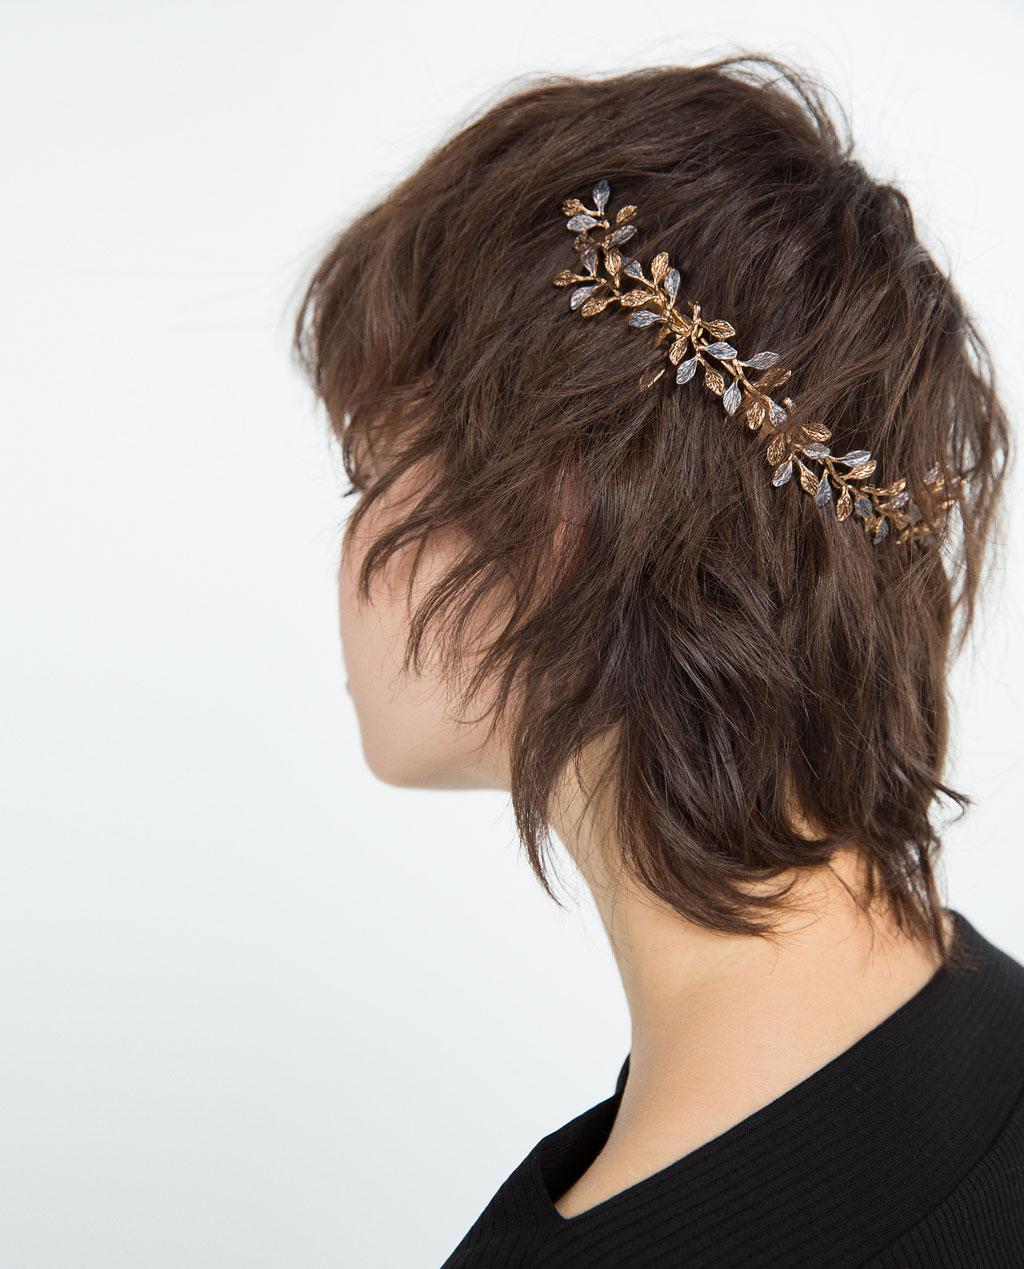 http//www.zara.com/es/es/mujer/accesorios/bisuteria/diadema,r%C3%ADgida,flores,c589501p3187222.html